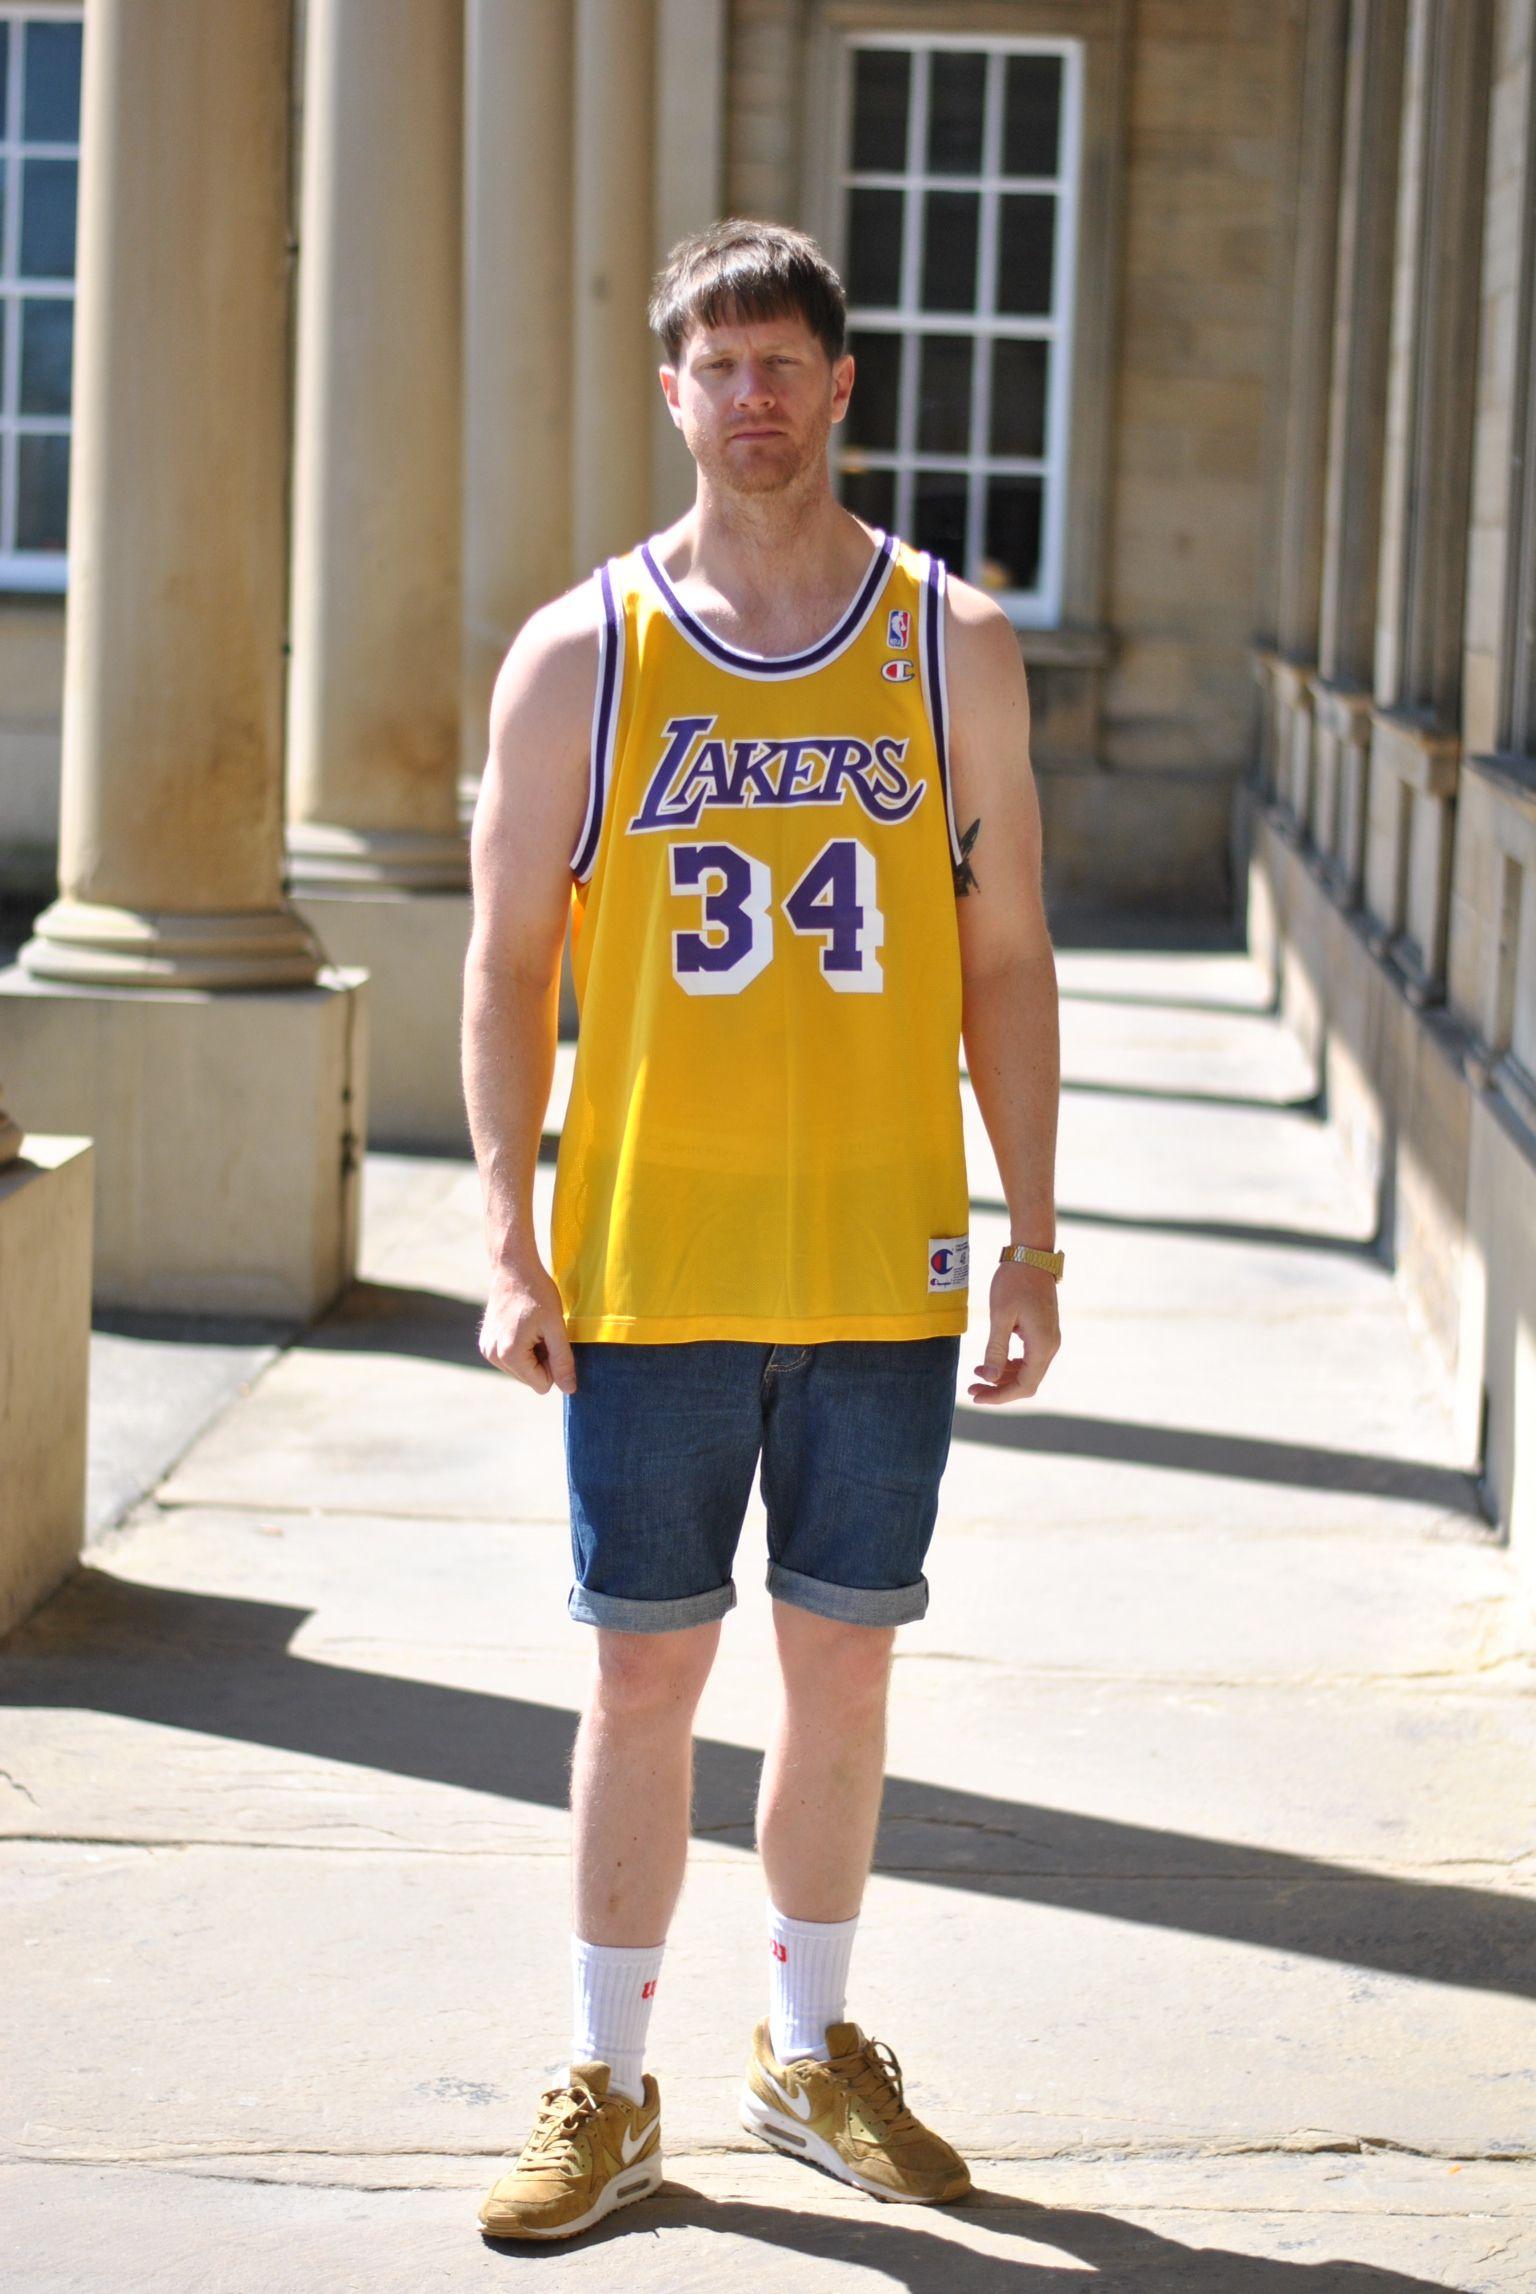 pretty nice 909c9 d3a9e LA Lakers jersey | Stuff I want to get | La lakers jersey ...